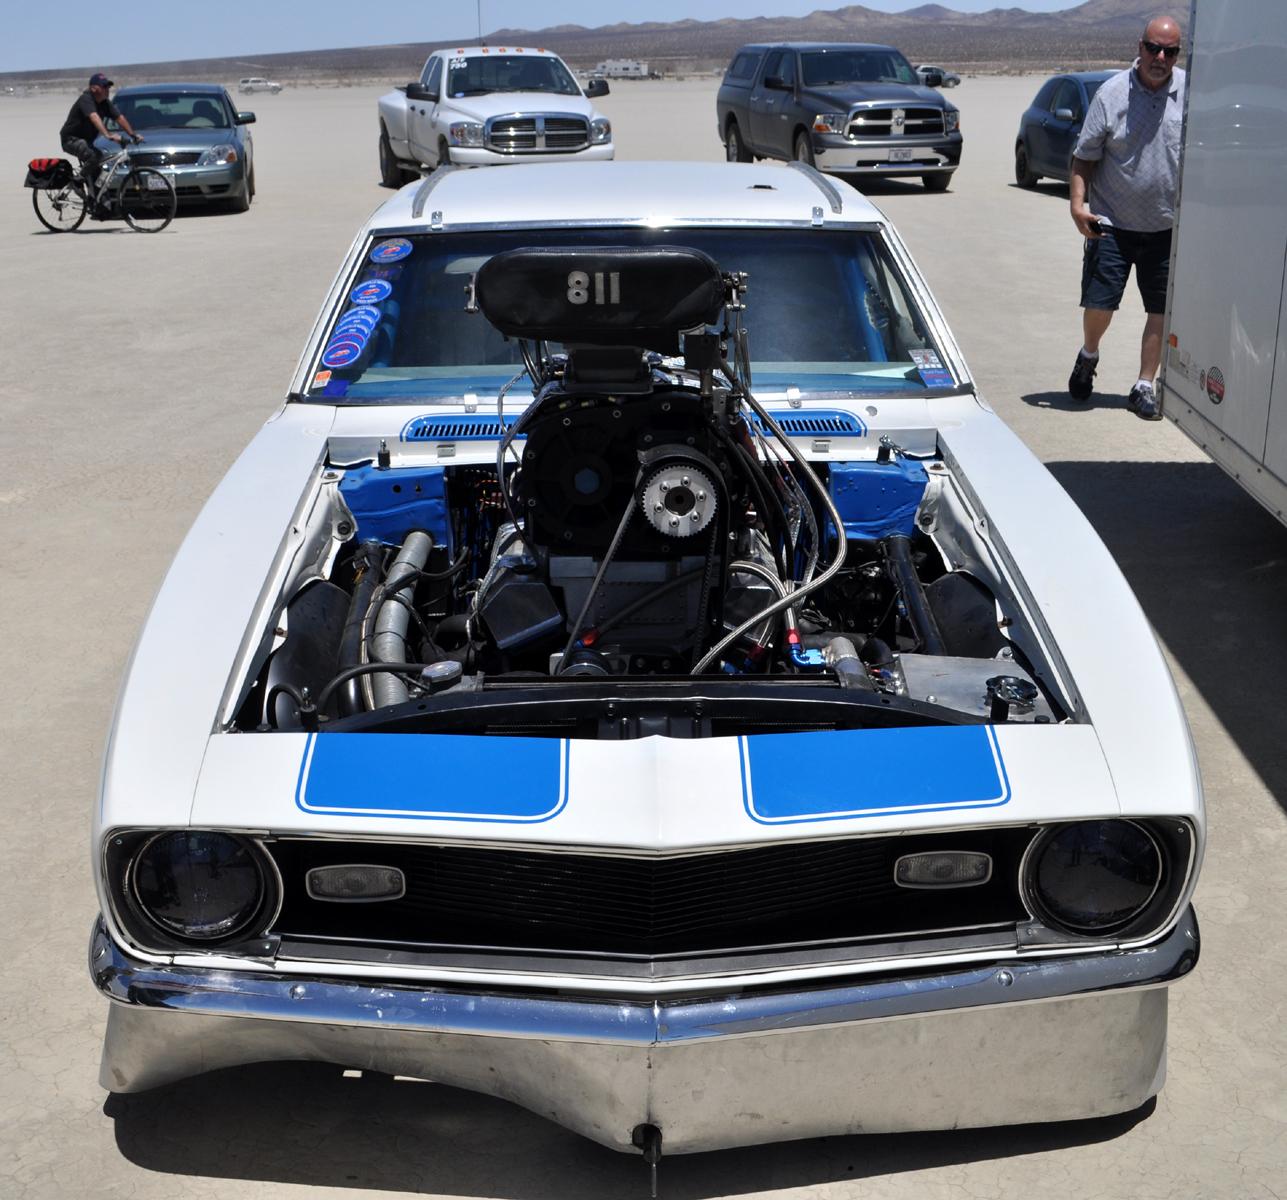 Big Blower Supercharger: Just A Car Guy: '68 Camaro With A Big Damn 8-71 Supercharger